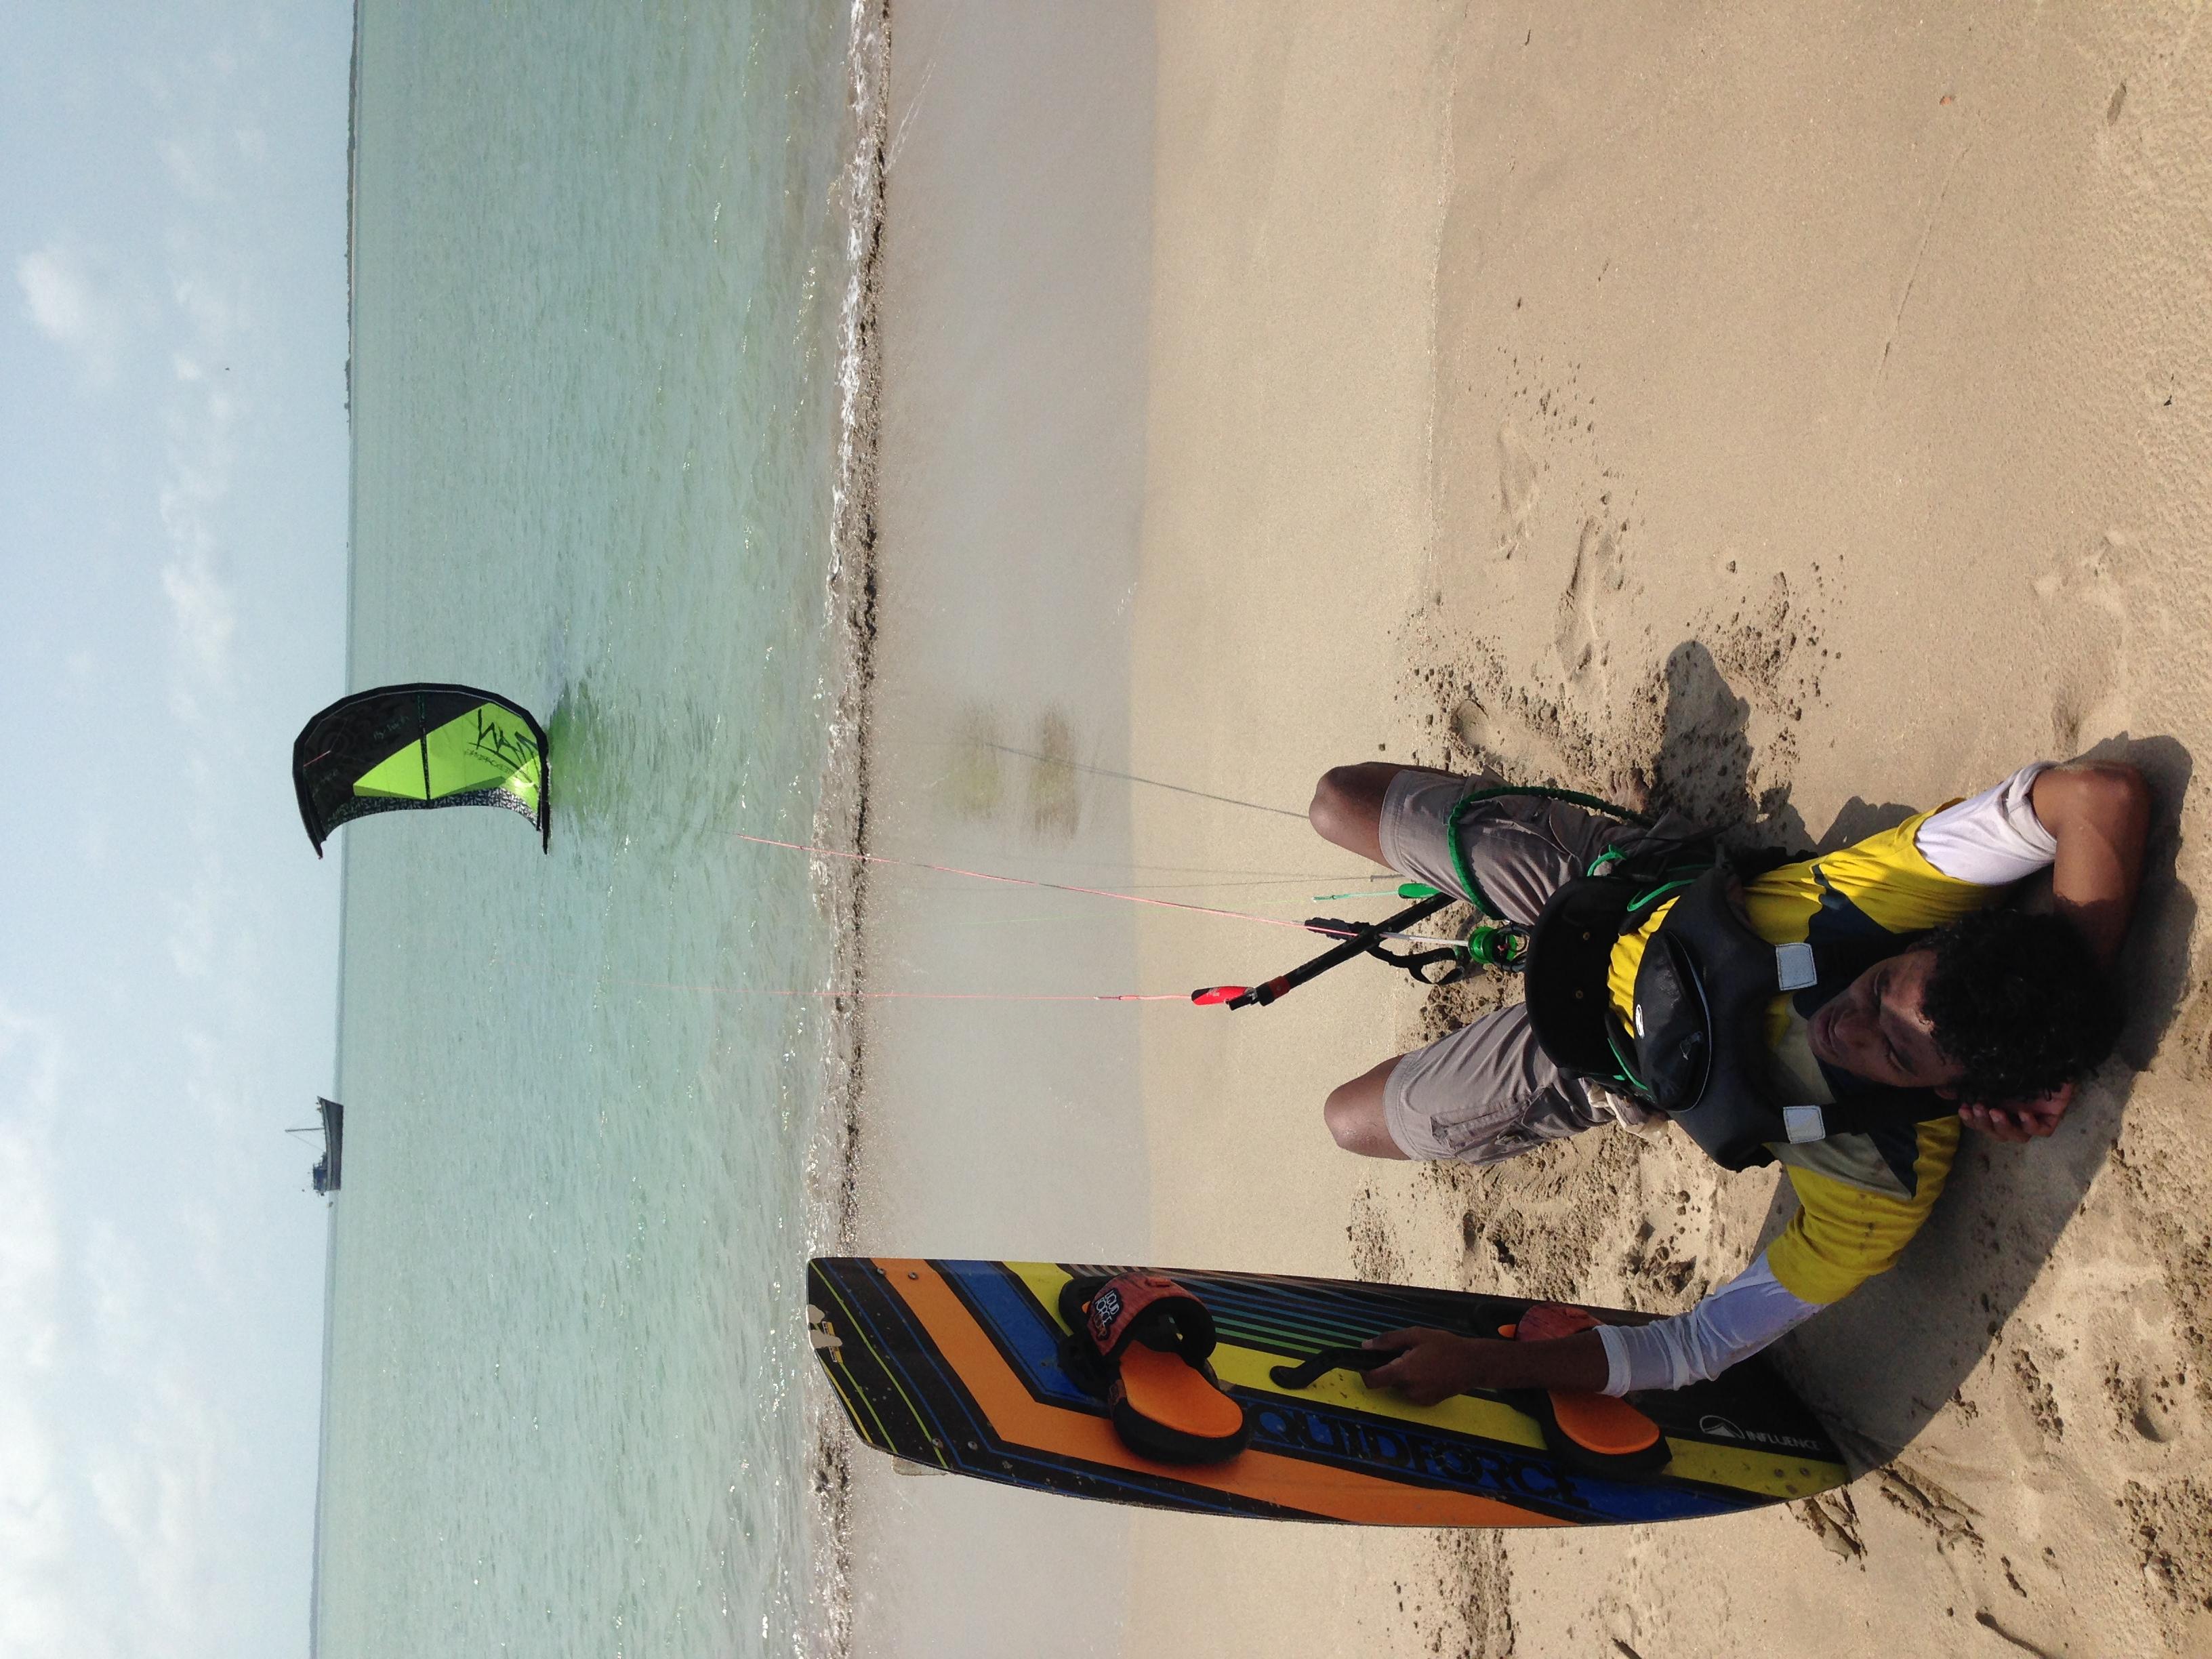 Kiteboarder from Chennai takes a break